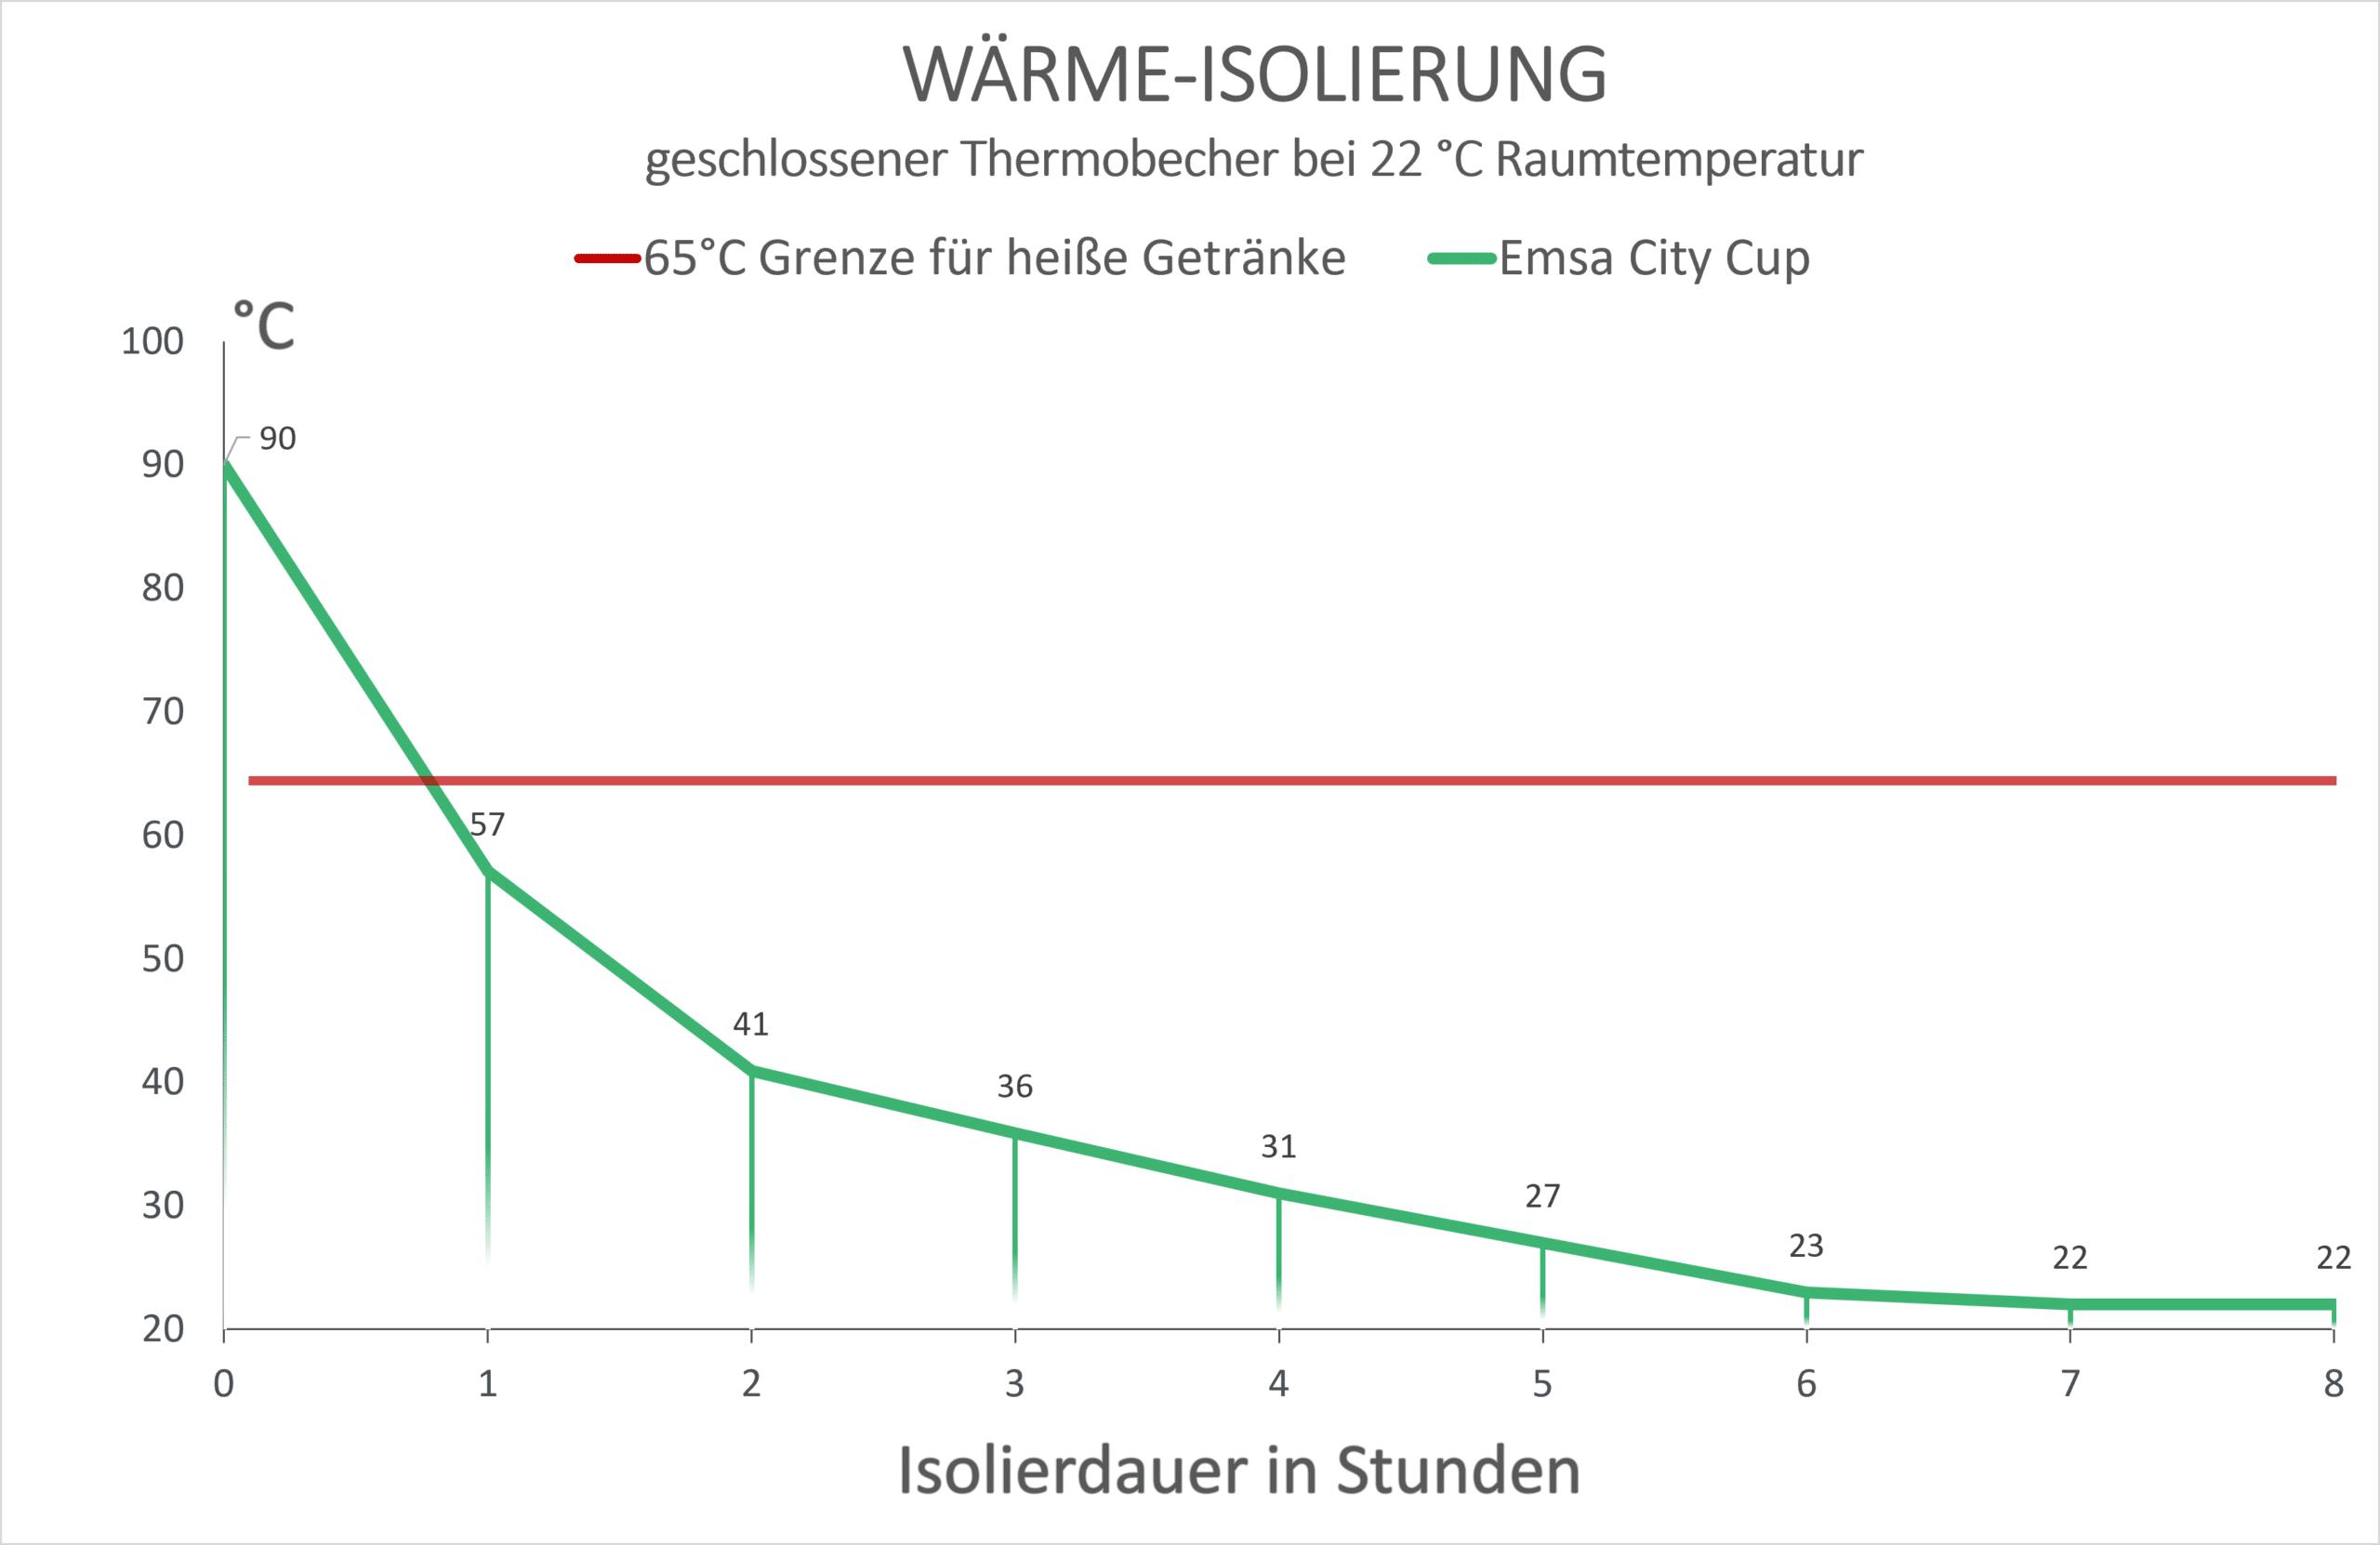 Emsa City Cup Wärme-Isolierung Diagramm